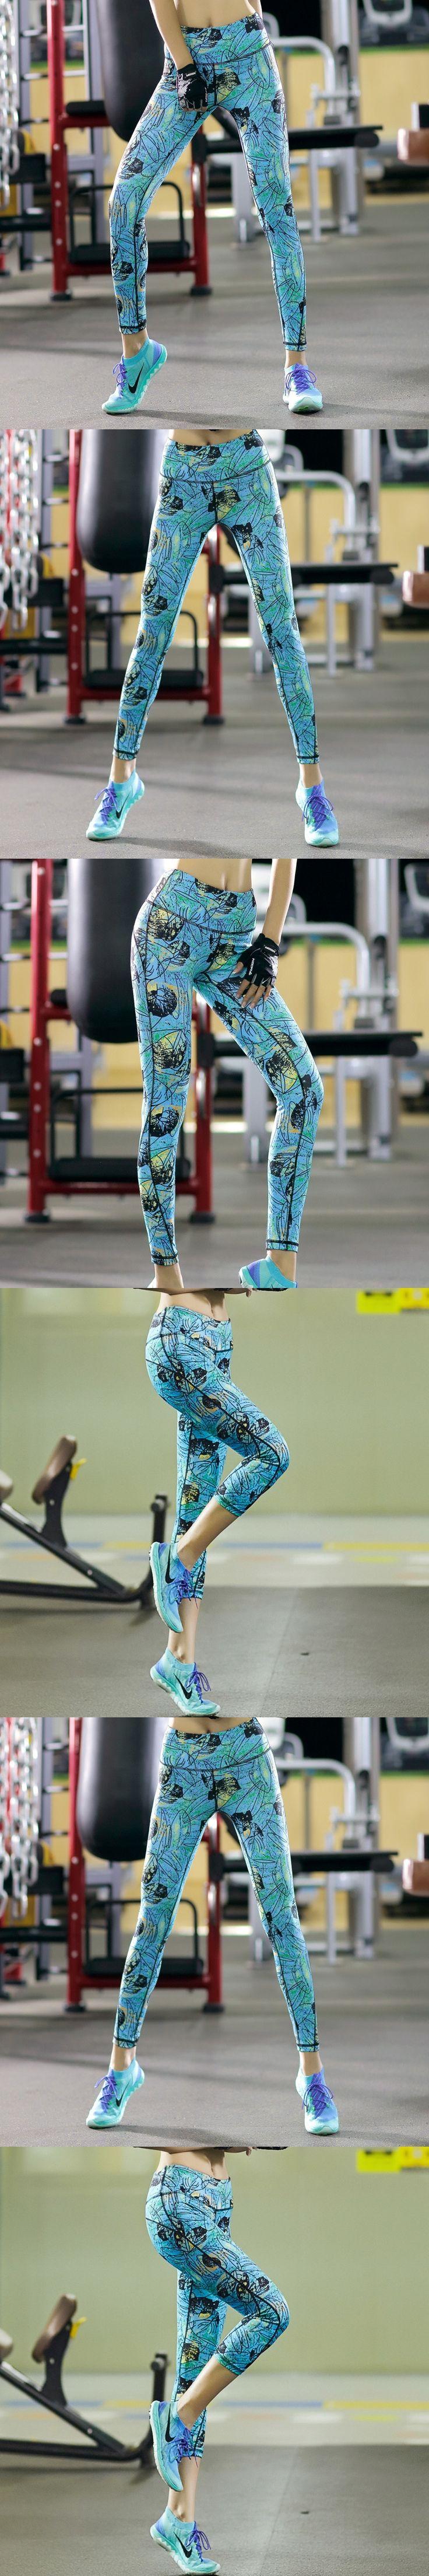 Sexy 3D Print Yoga Pants Seventh and Ninth Yoga Leggings Push Up Running Sport Tights Women Sportswear sportkleding Shop Online